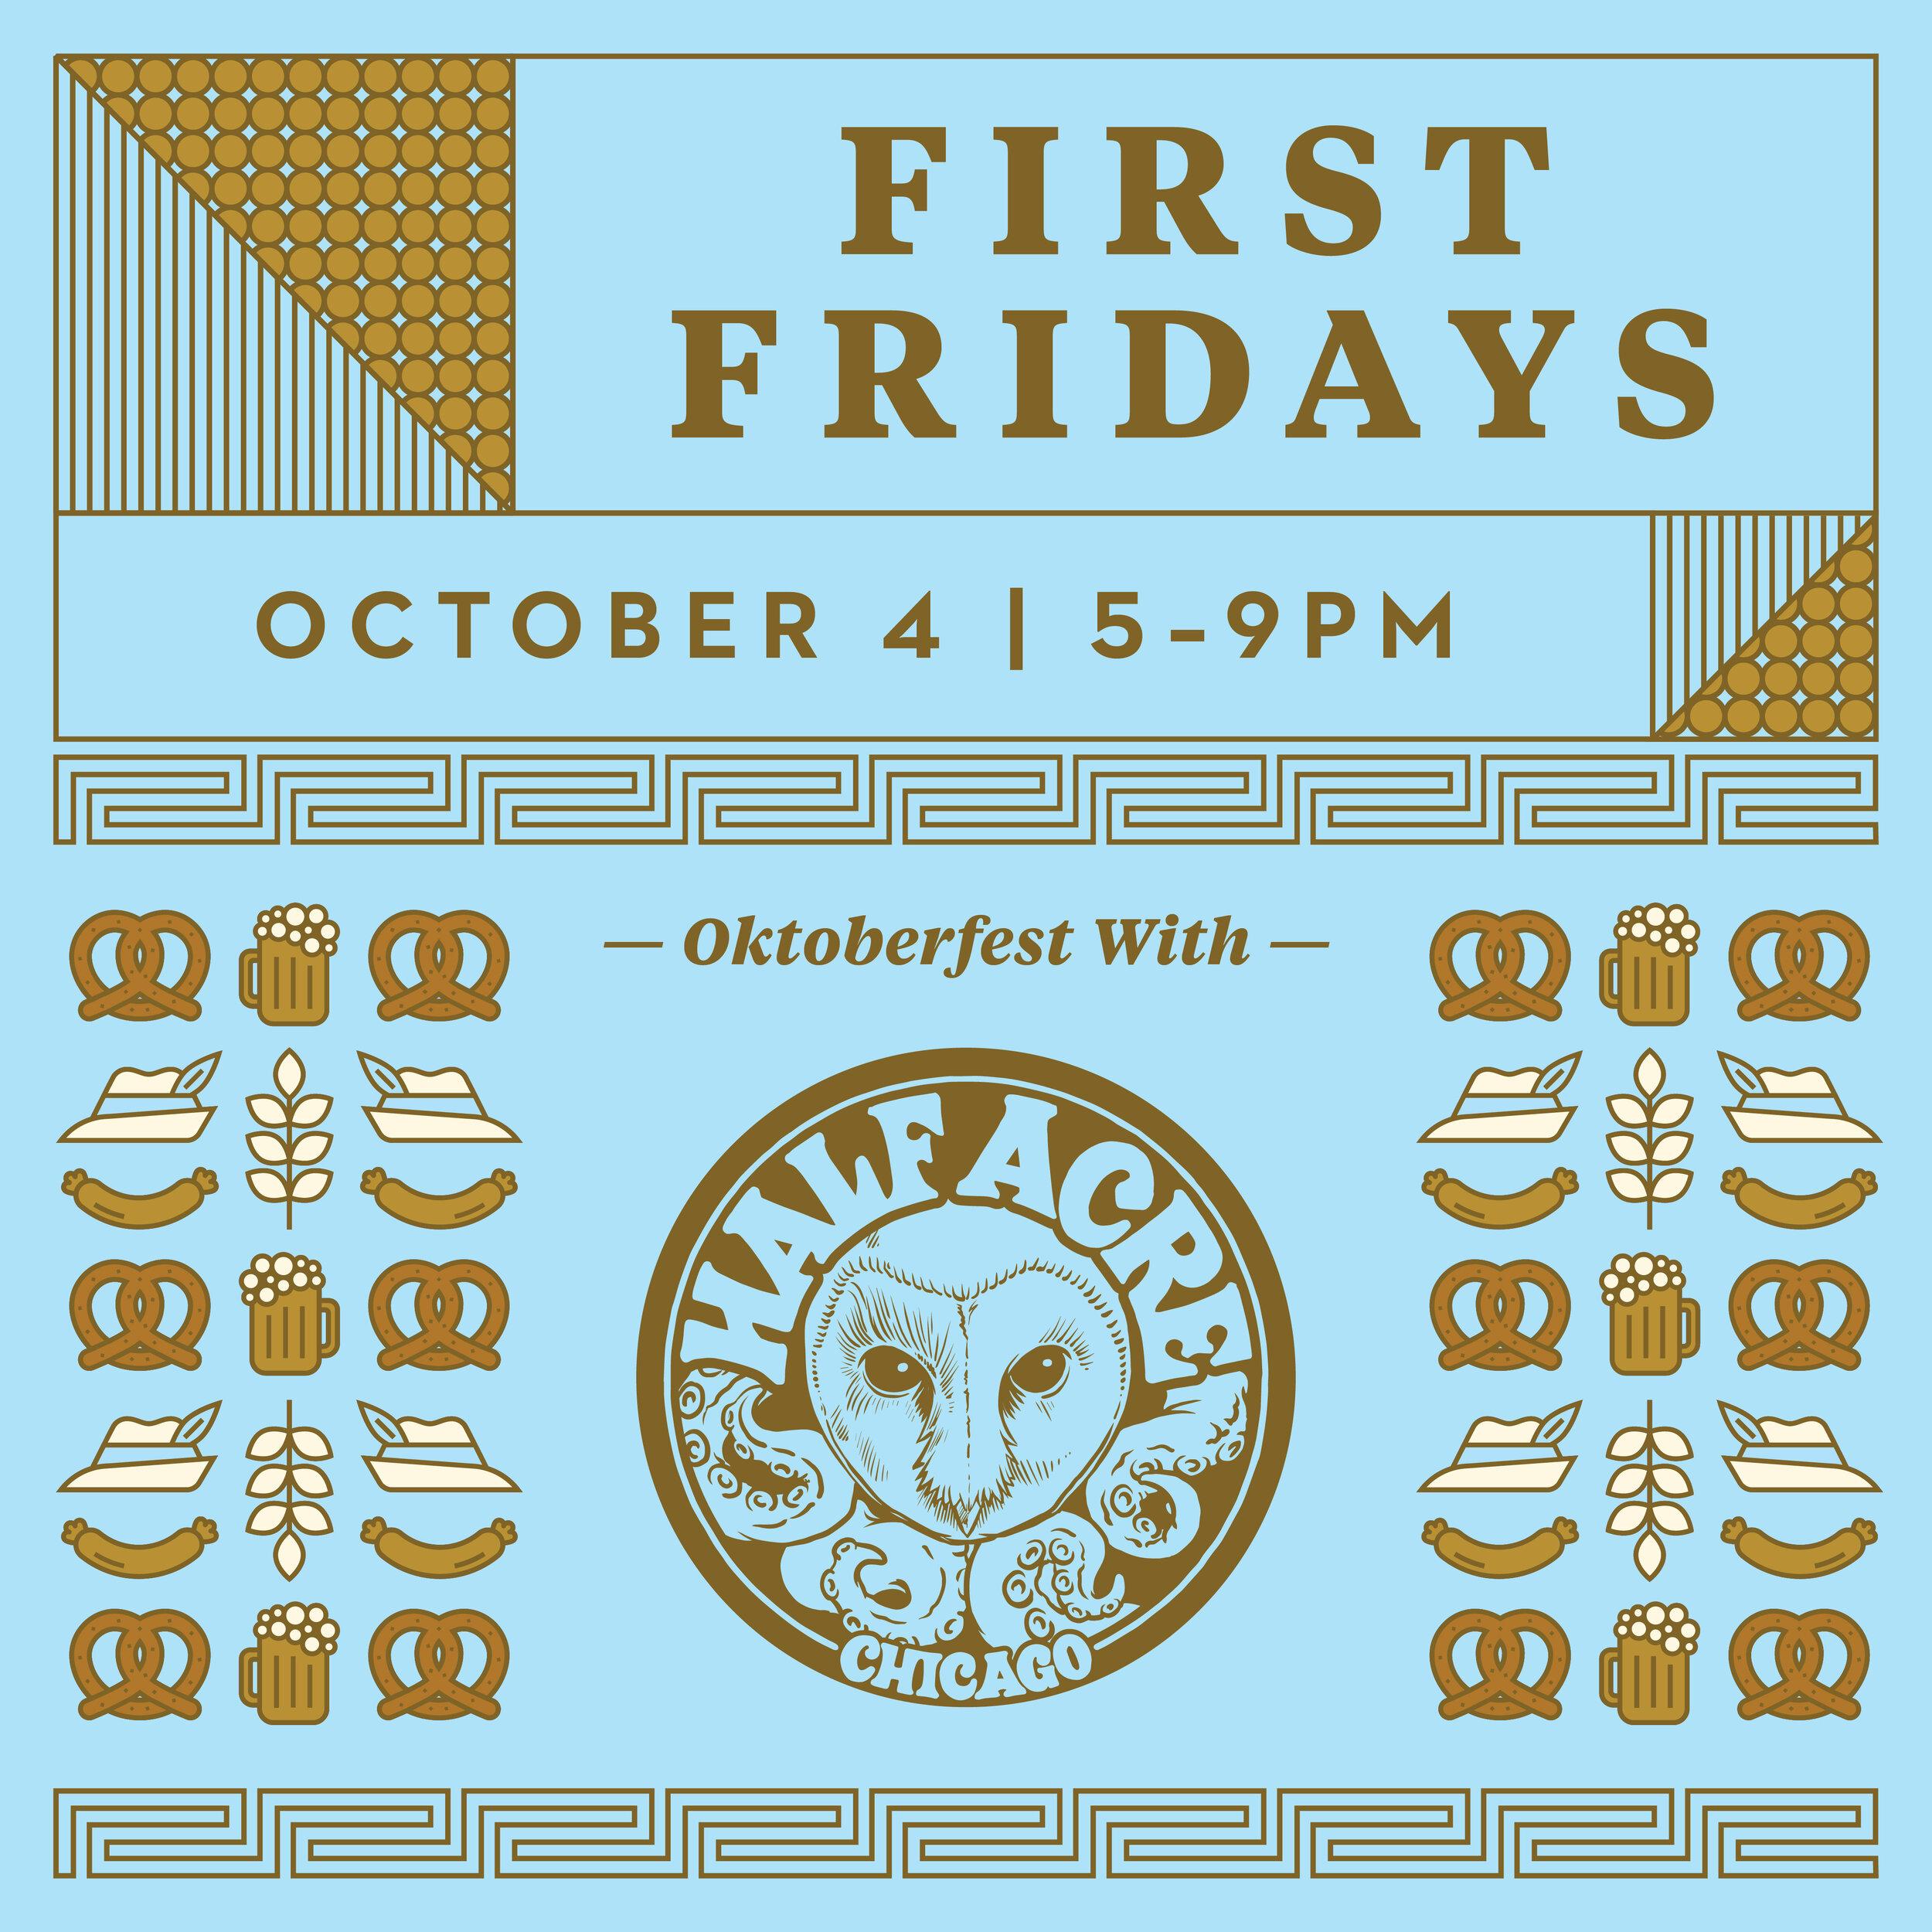 Oct_FirstFridays_Insta.jpg